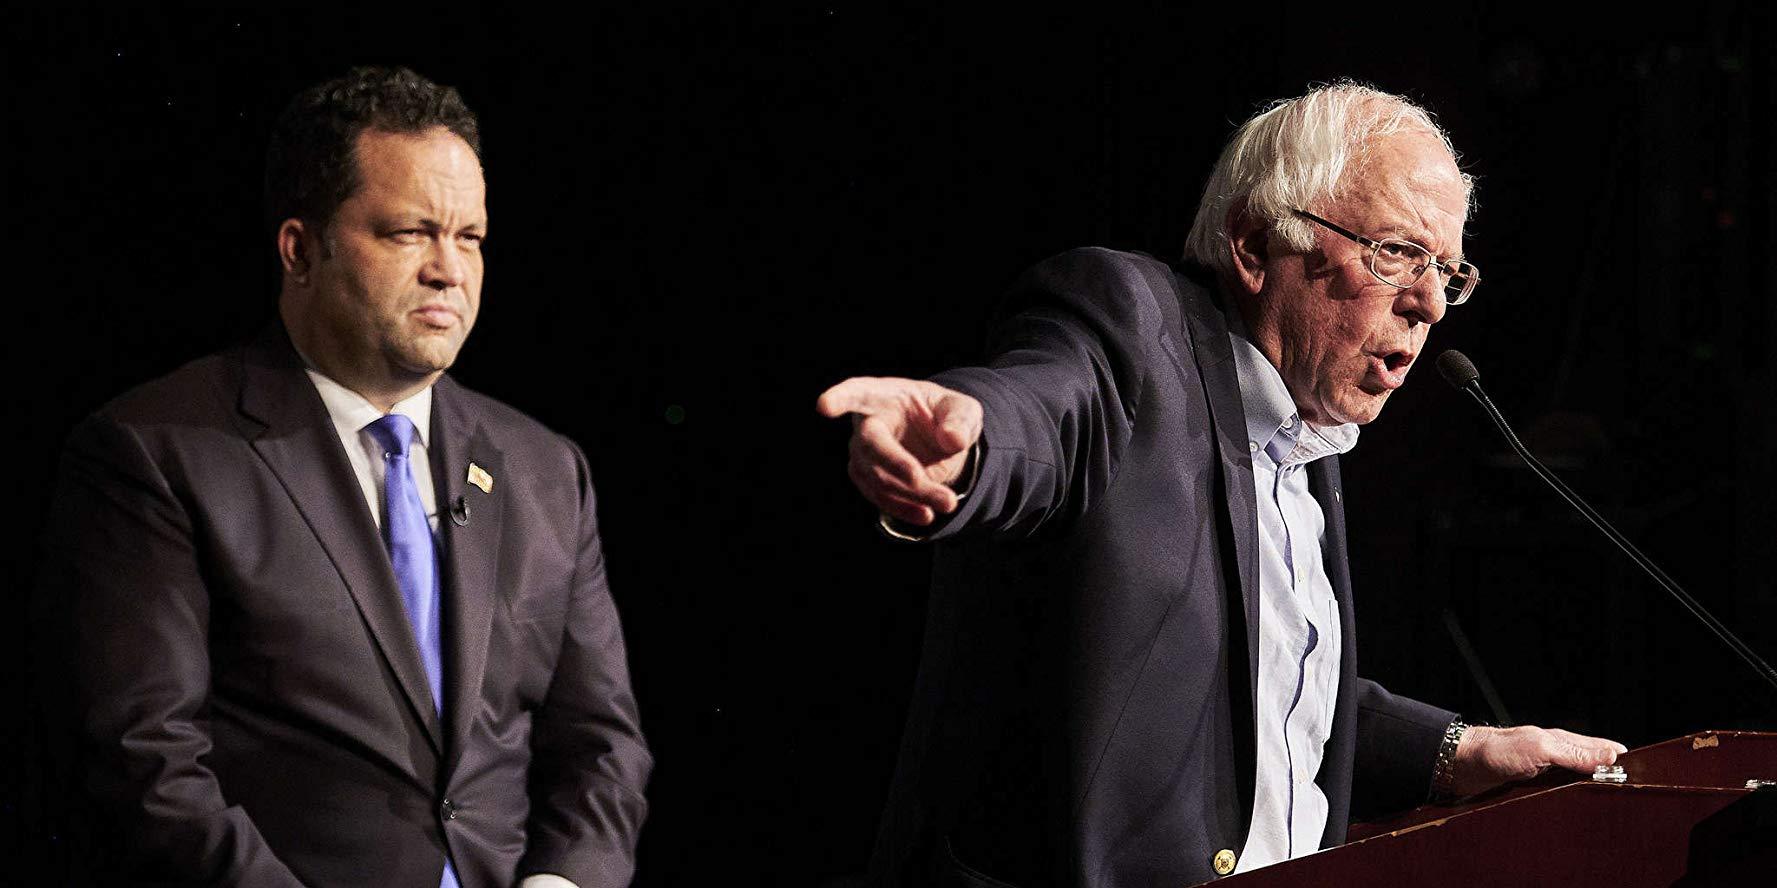 The Circus: Inside the Greatest Political Show on Earth - Season 4